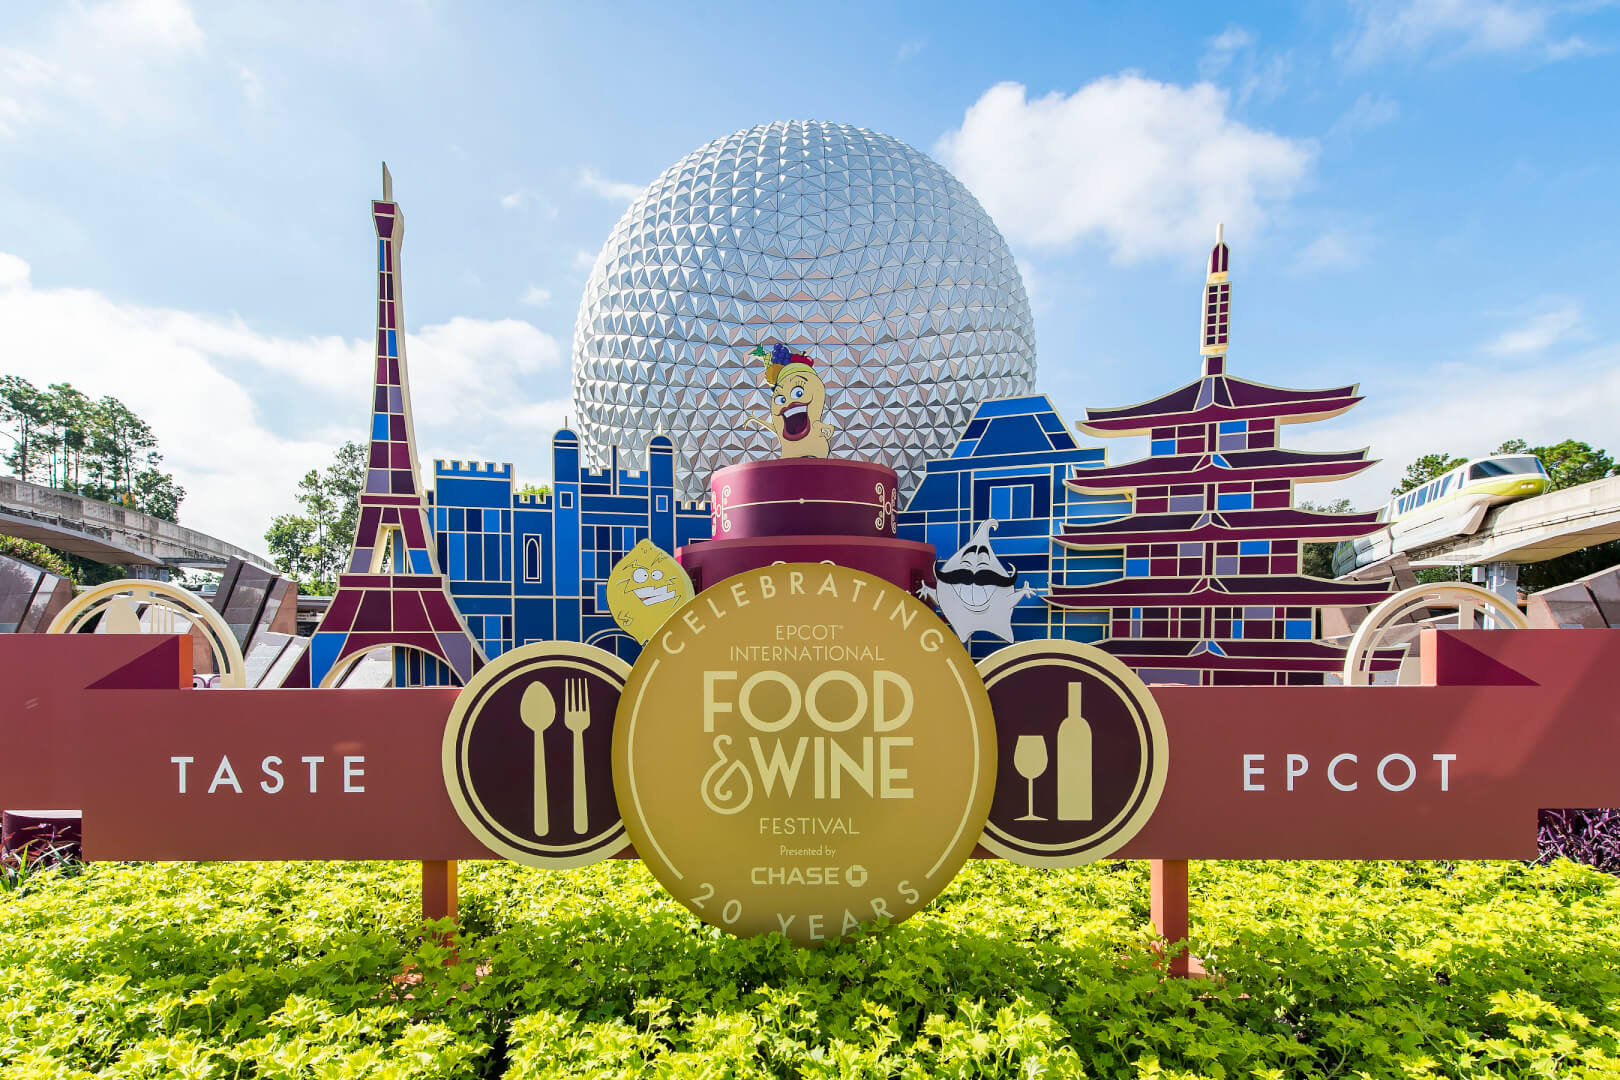 4 Tips for Ultimate Disney Food & Wine Festival Success